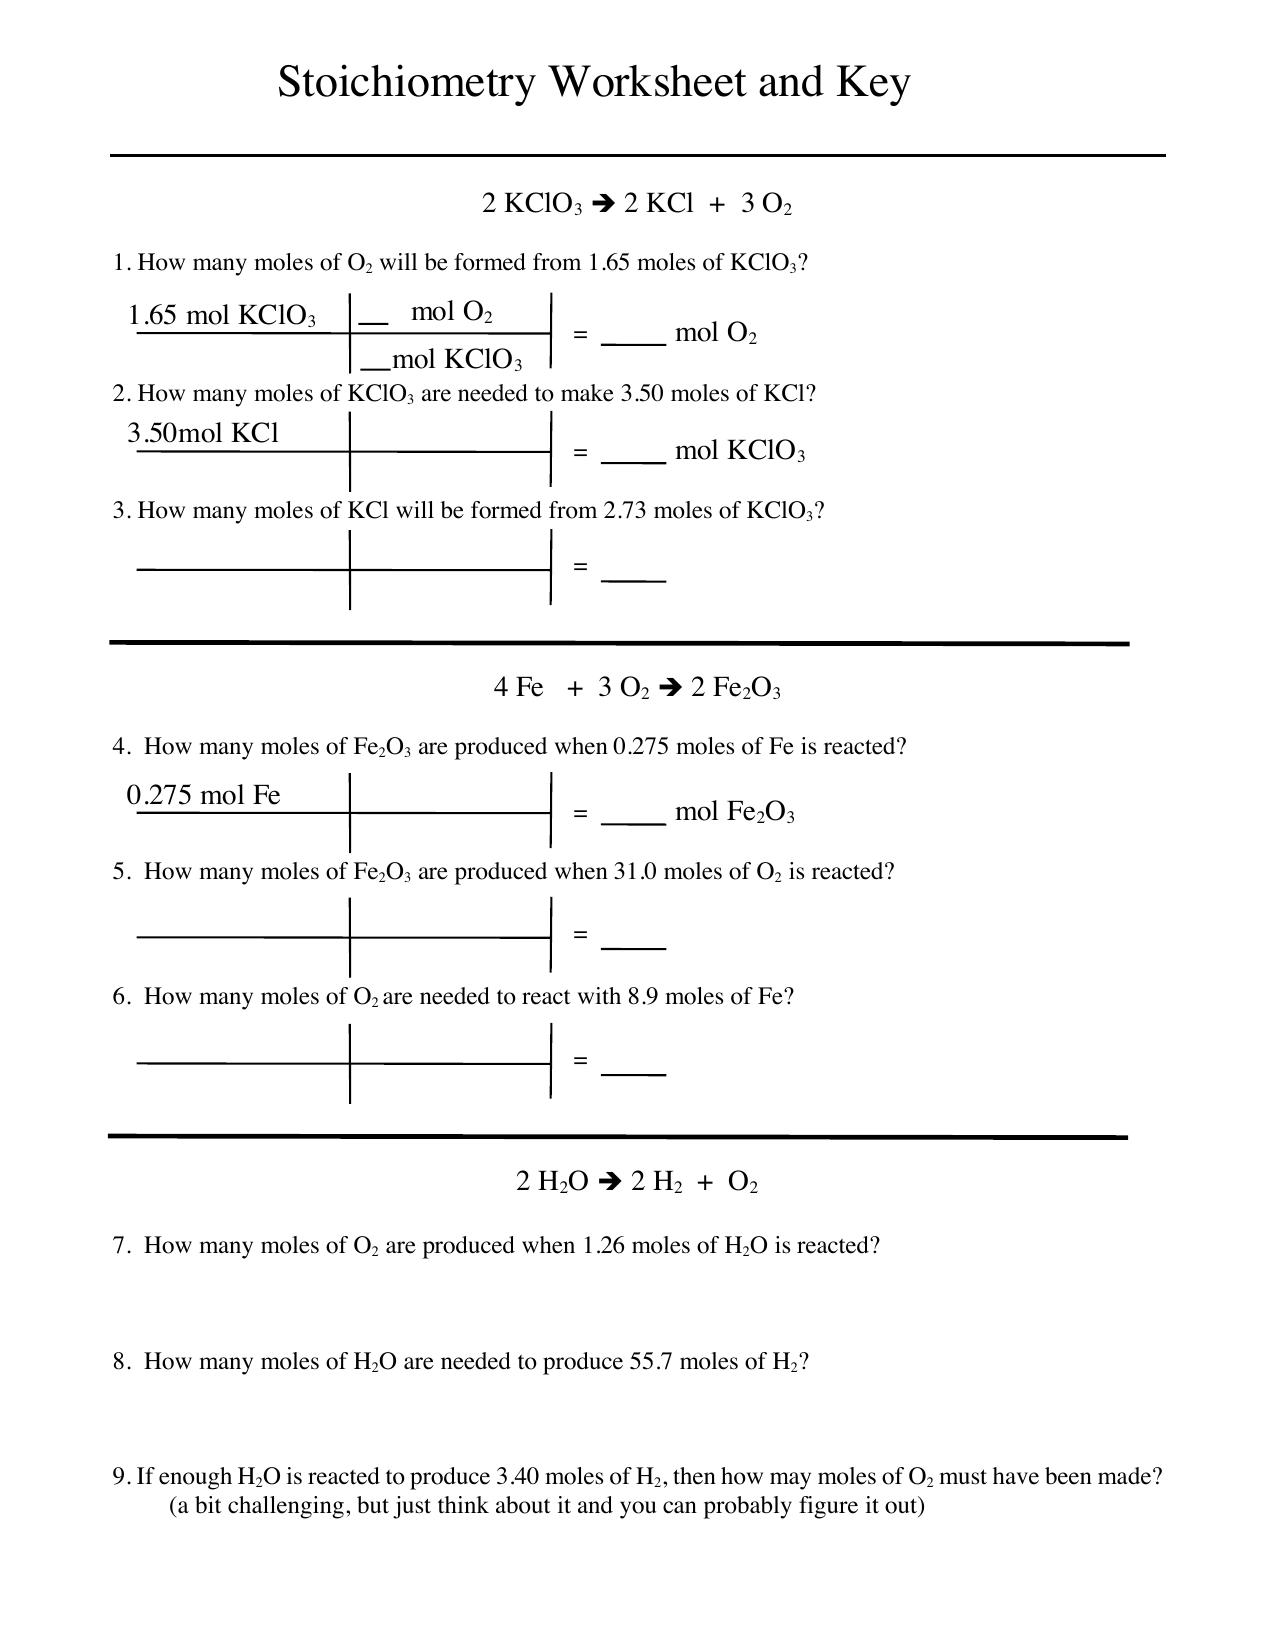 Stoichiometry 1 Worksheet And Key